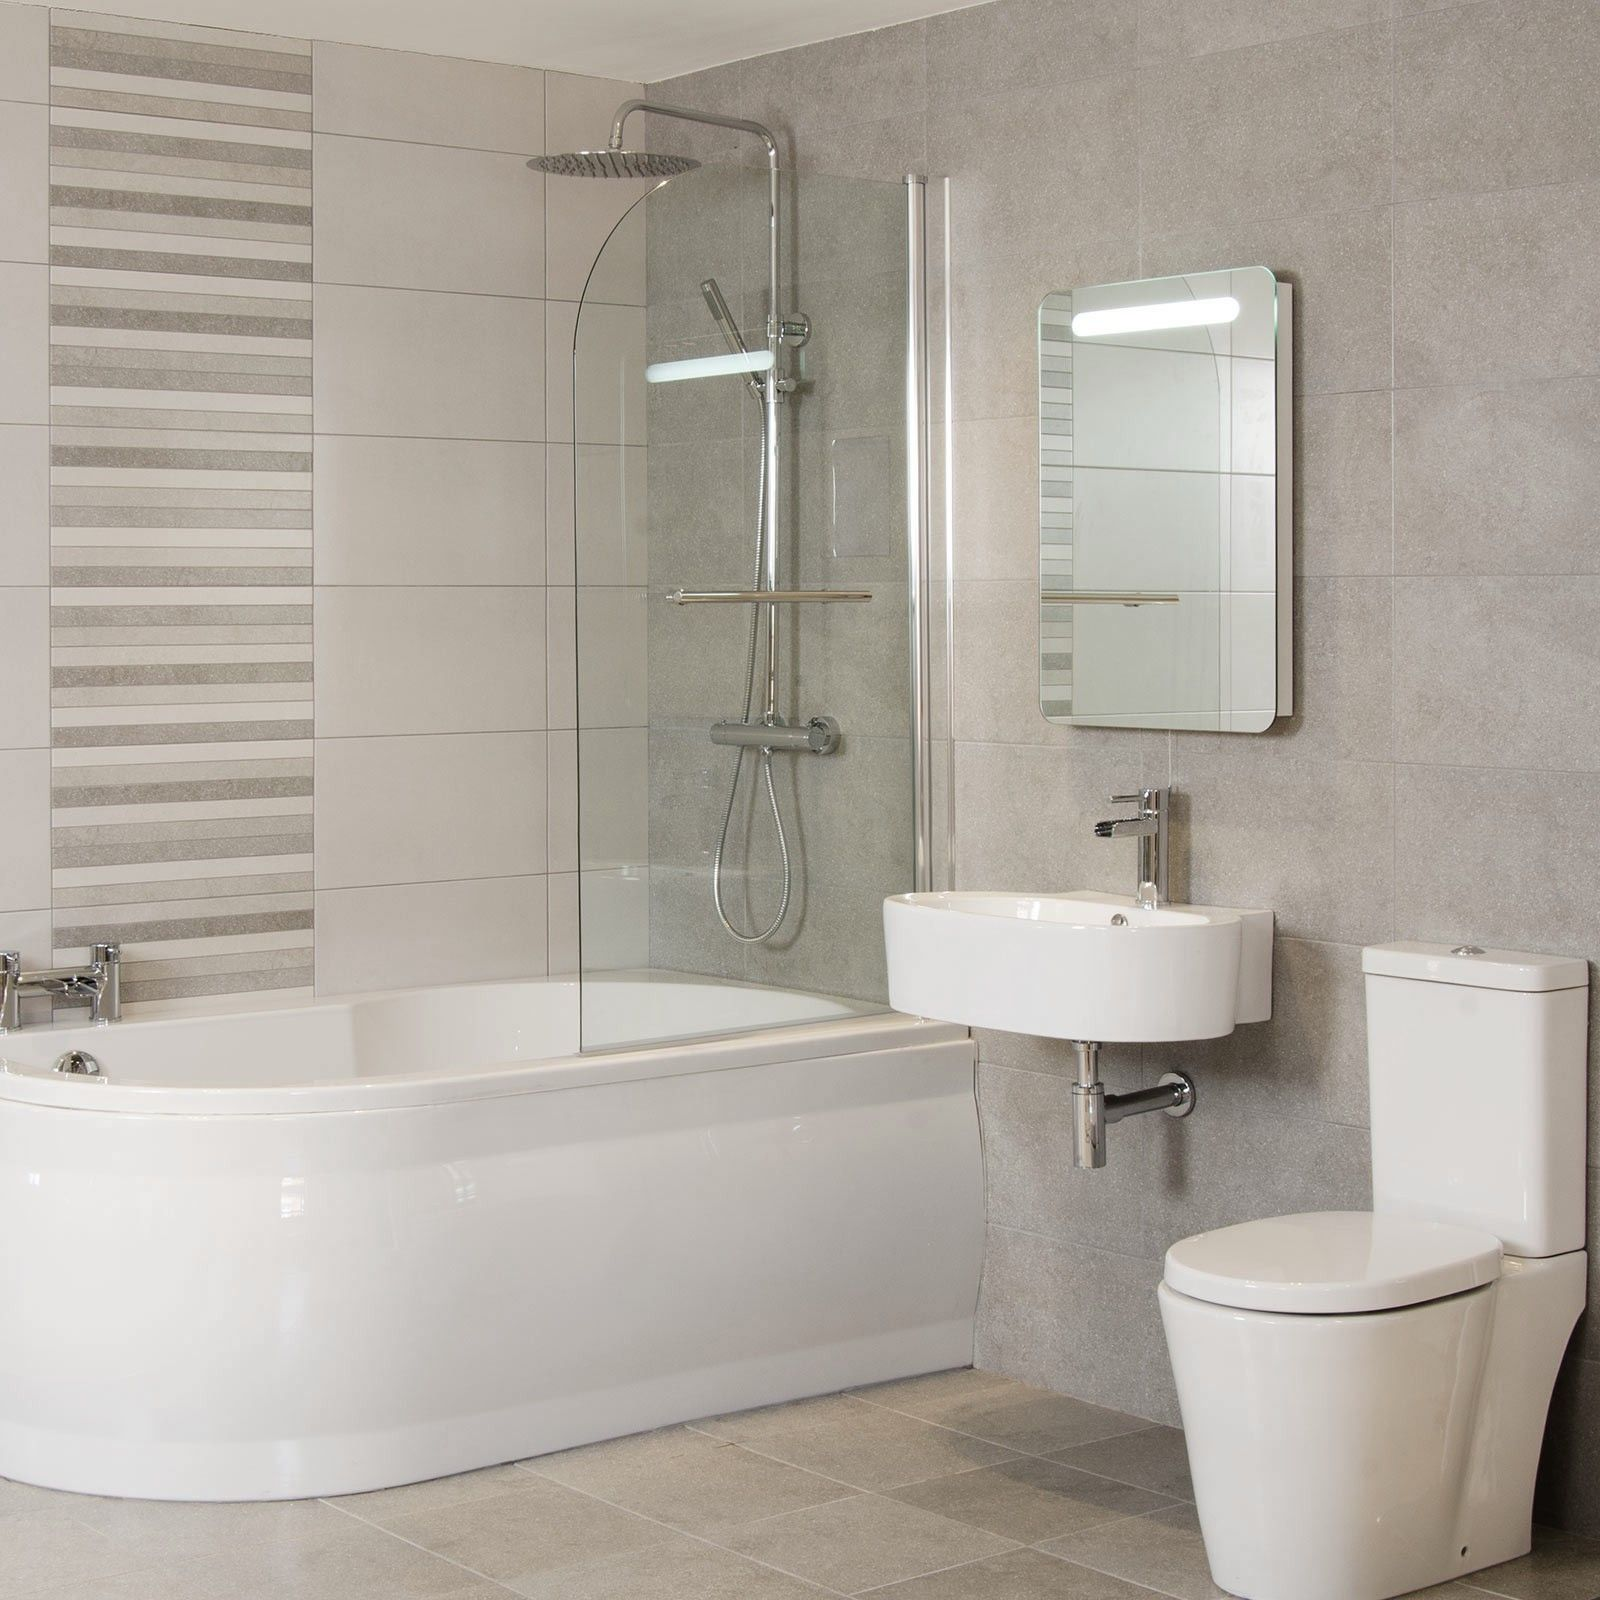 Bucsy Grafito Wall Tile Spring Bathroom Inspiration Spring Style Bathroom Tile Wallsbathroomsceramic Floor